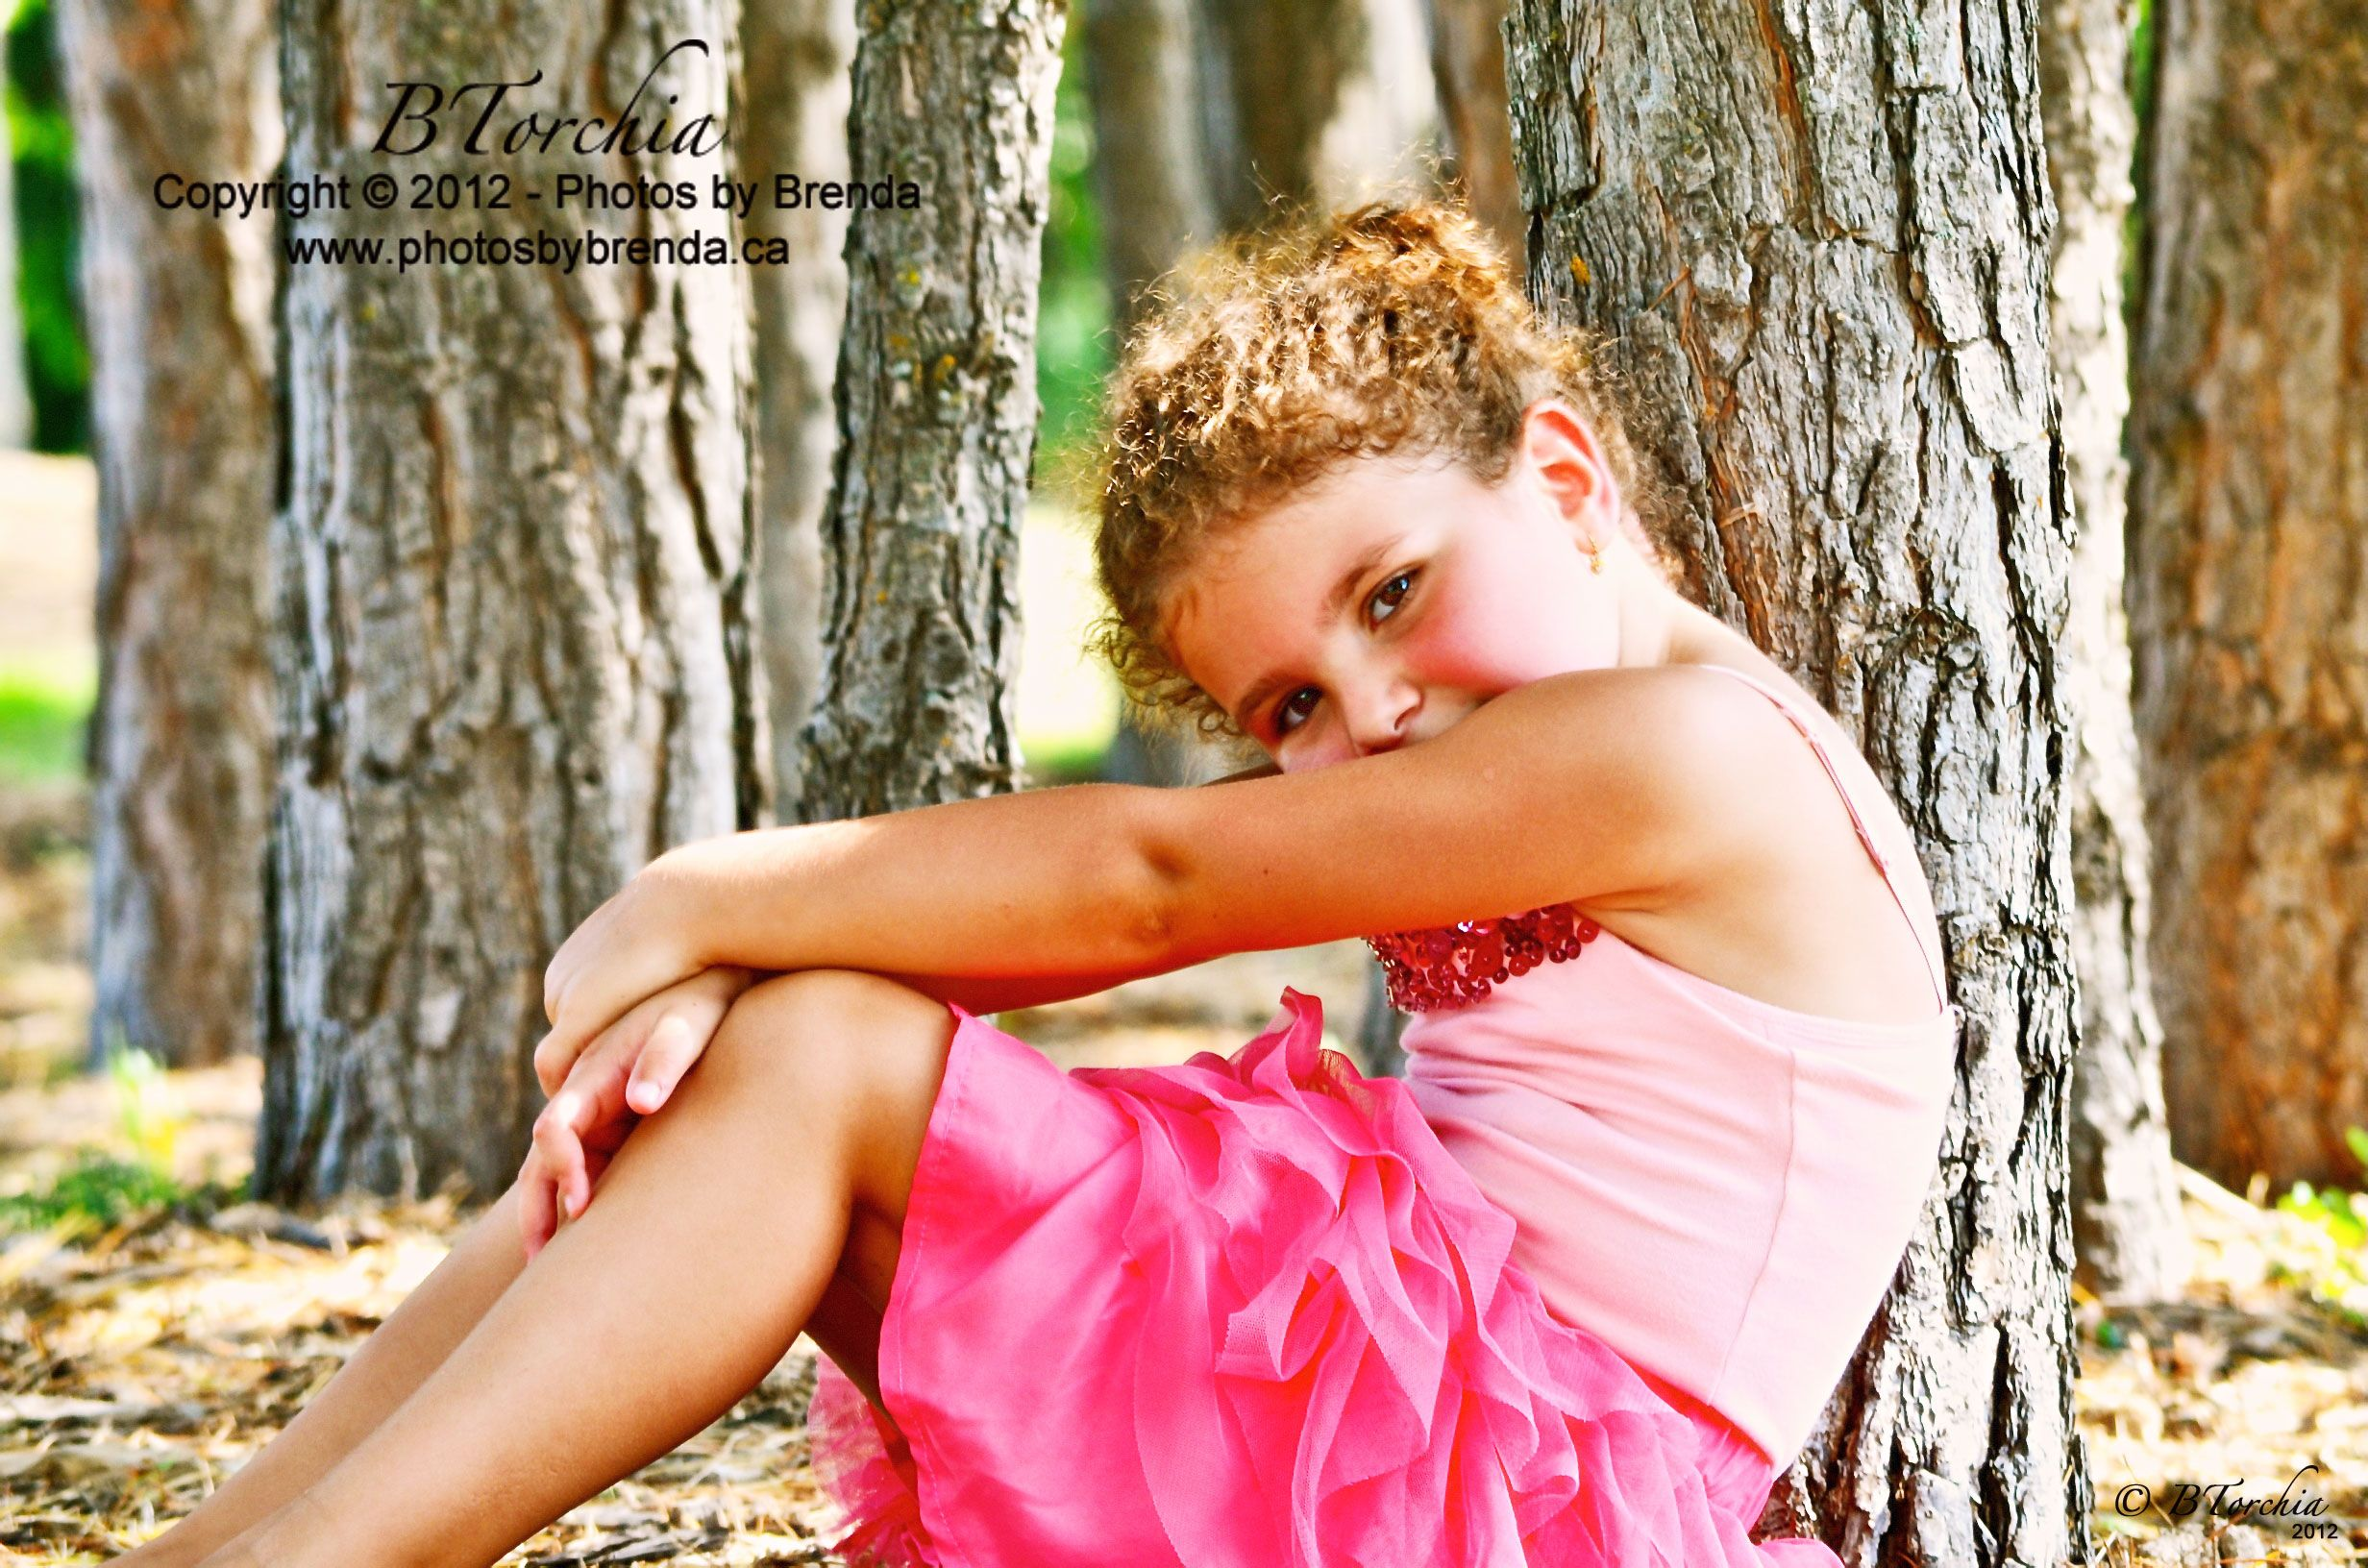 Photos by Brenda - Children's Photography. COPYRIGHT © Photos by Brenda - DO NOT COPY -  www.photosbybrenda.ca